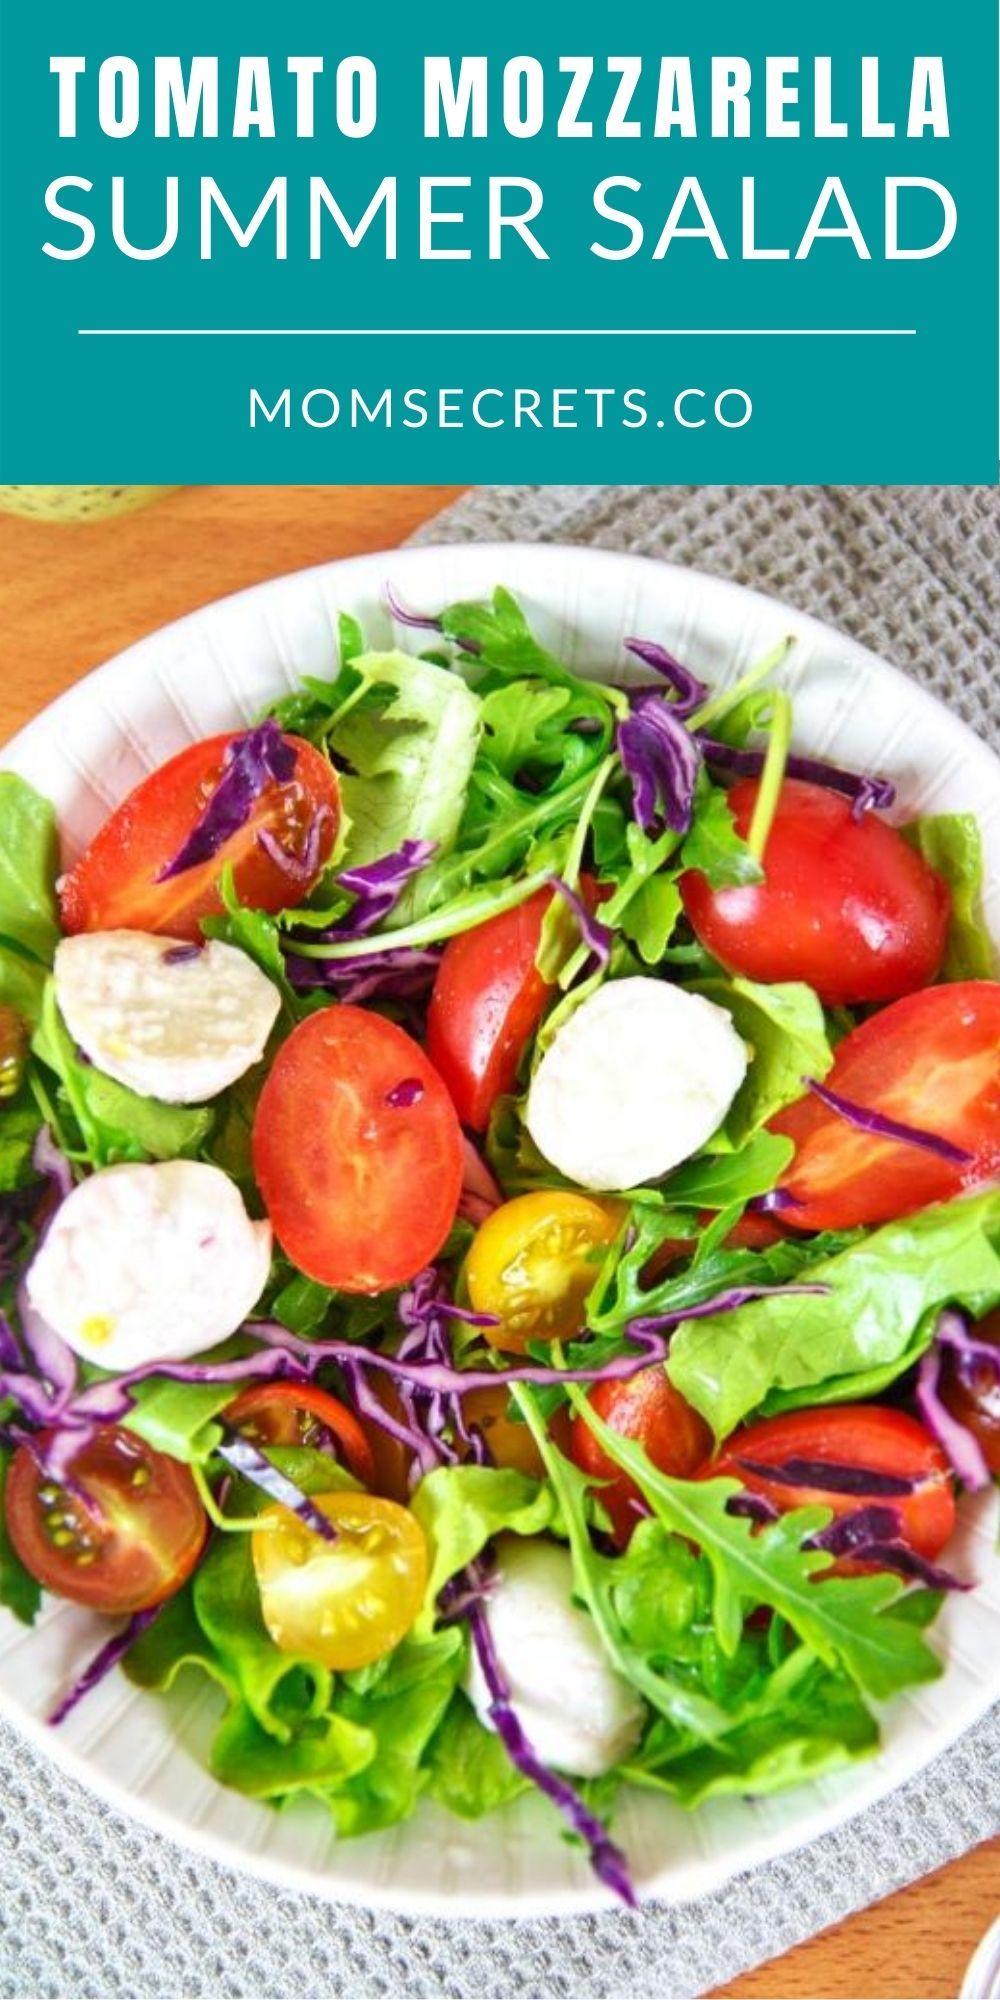 Best Summer Salad Recipe With Tomato Mozzarella And Arugula Recipe Salad Recipes Summer Salad Recipes Summer Salads [ 2000 x 1000 Pixel ]